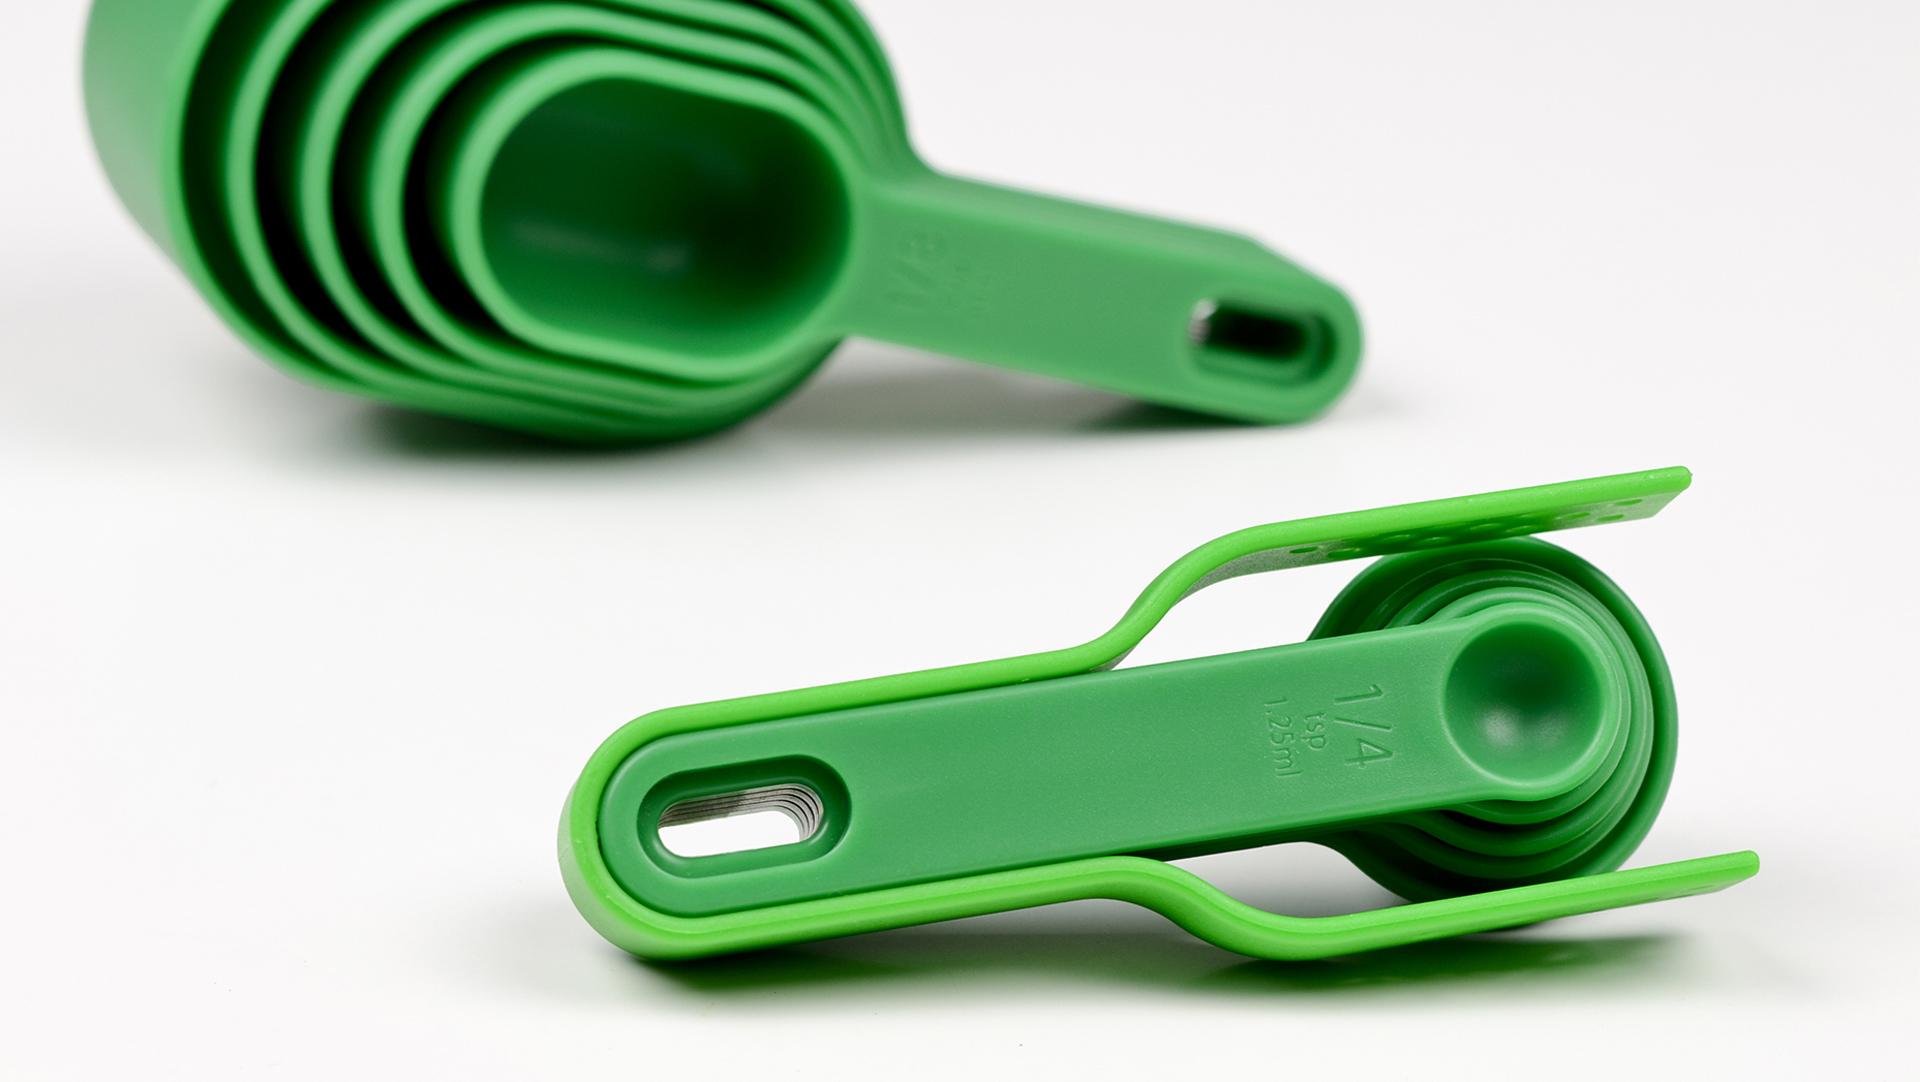 Venn measuring spoons